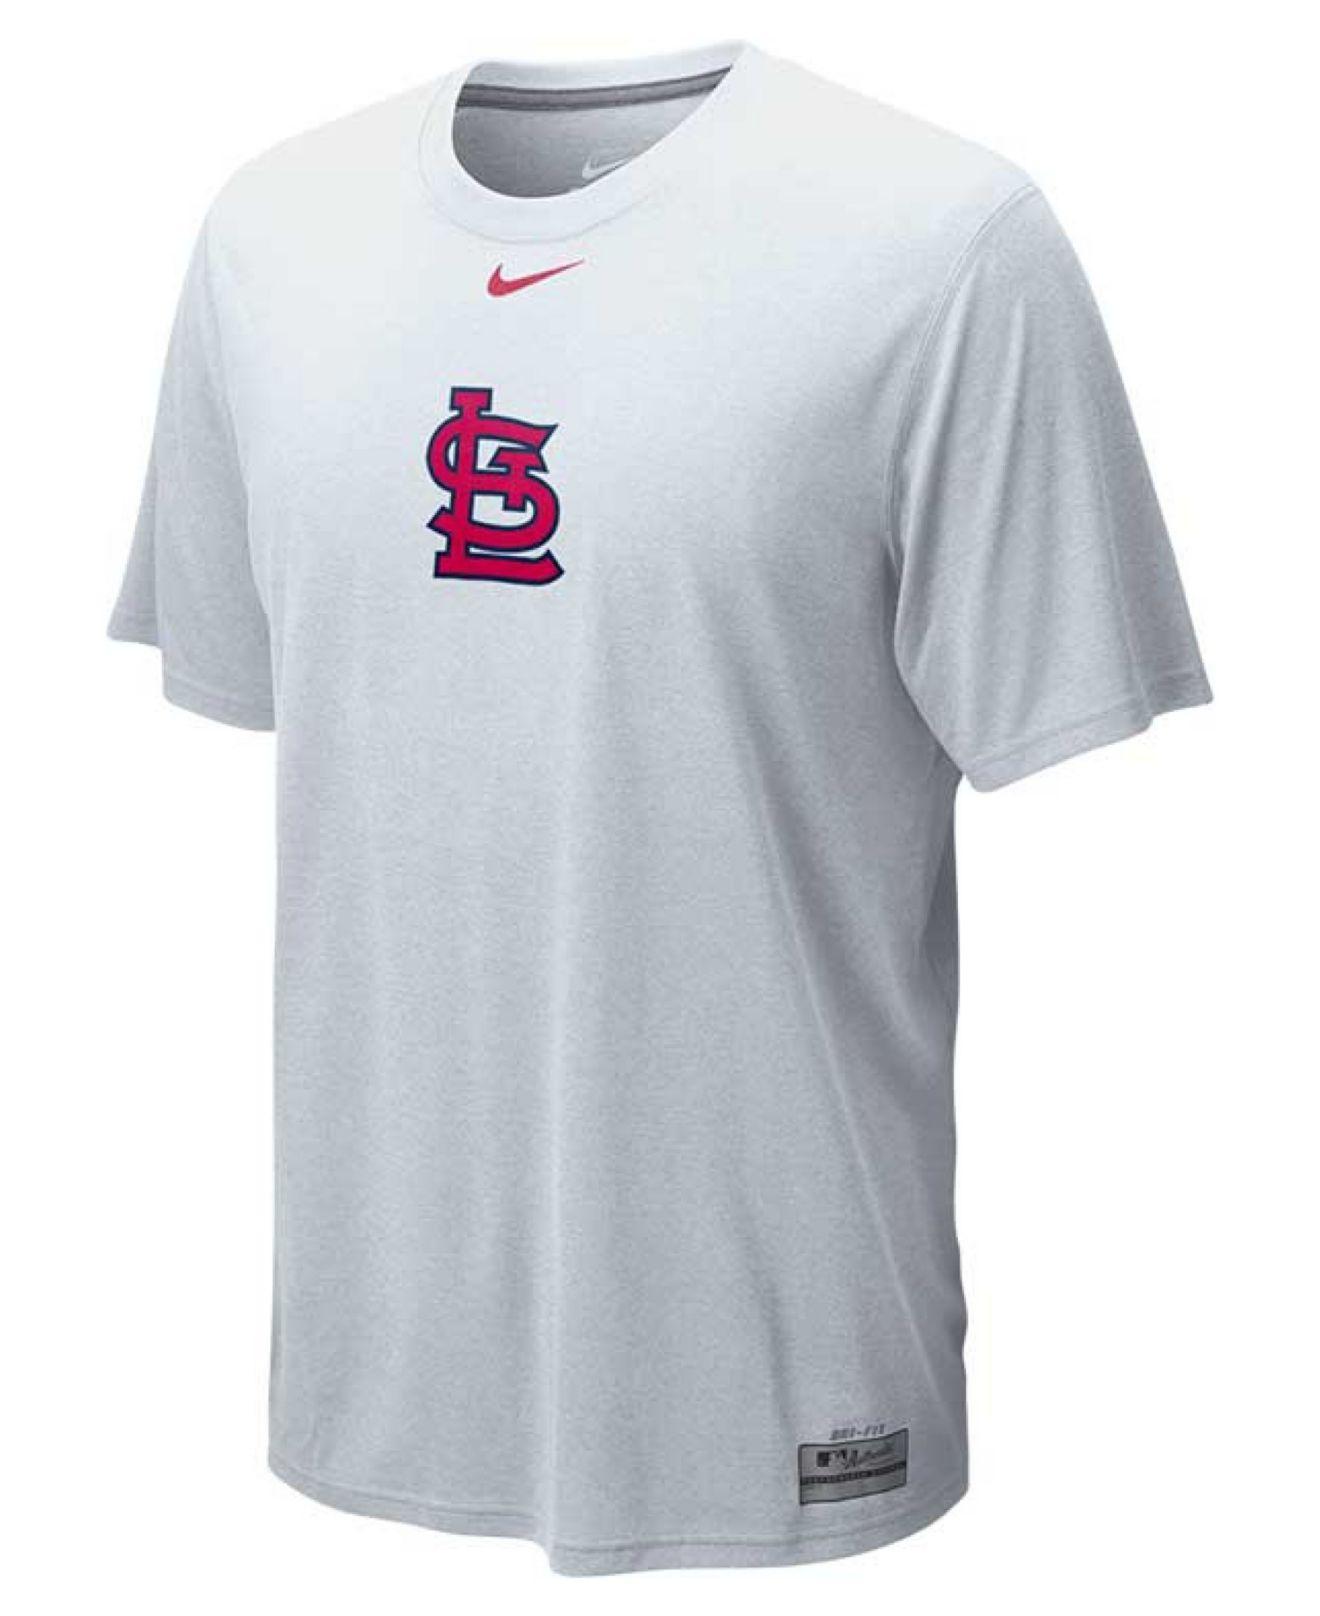 Nike Nfl Dri Fit Logo Legend T Shirt Mens - BCD Tofu House b35b5f4c4